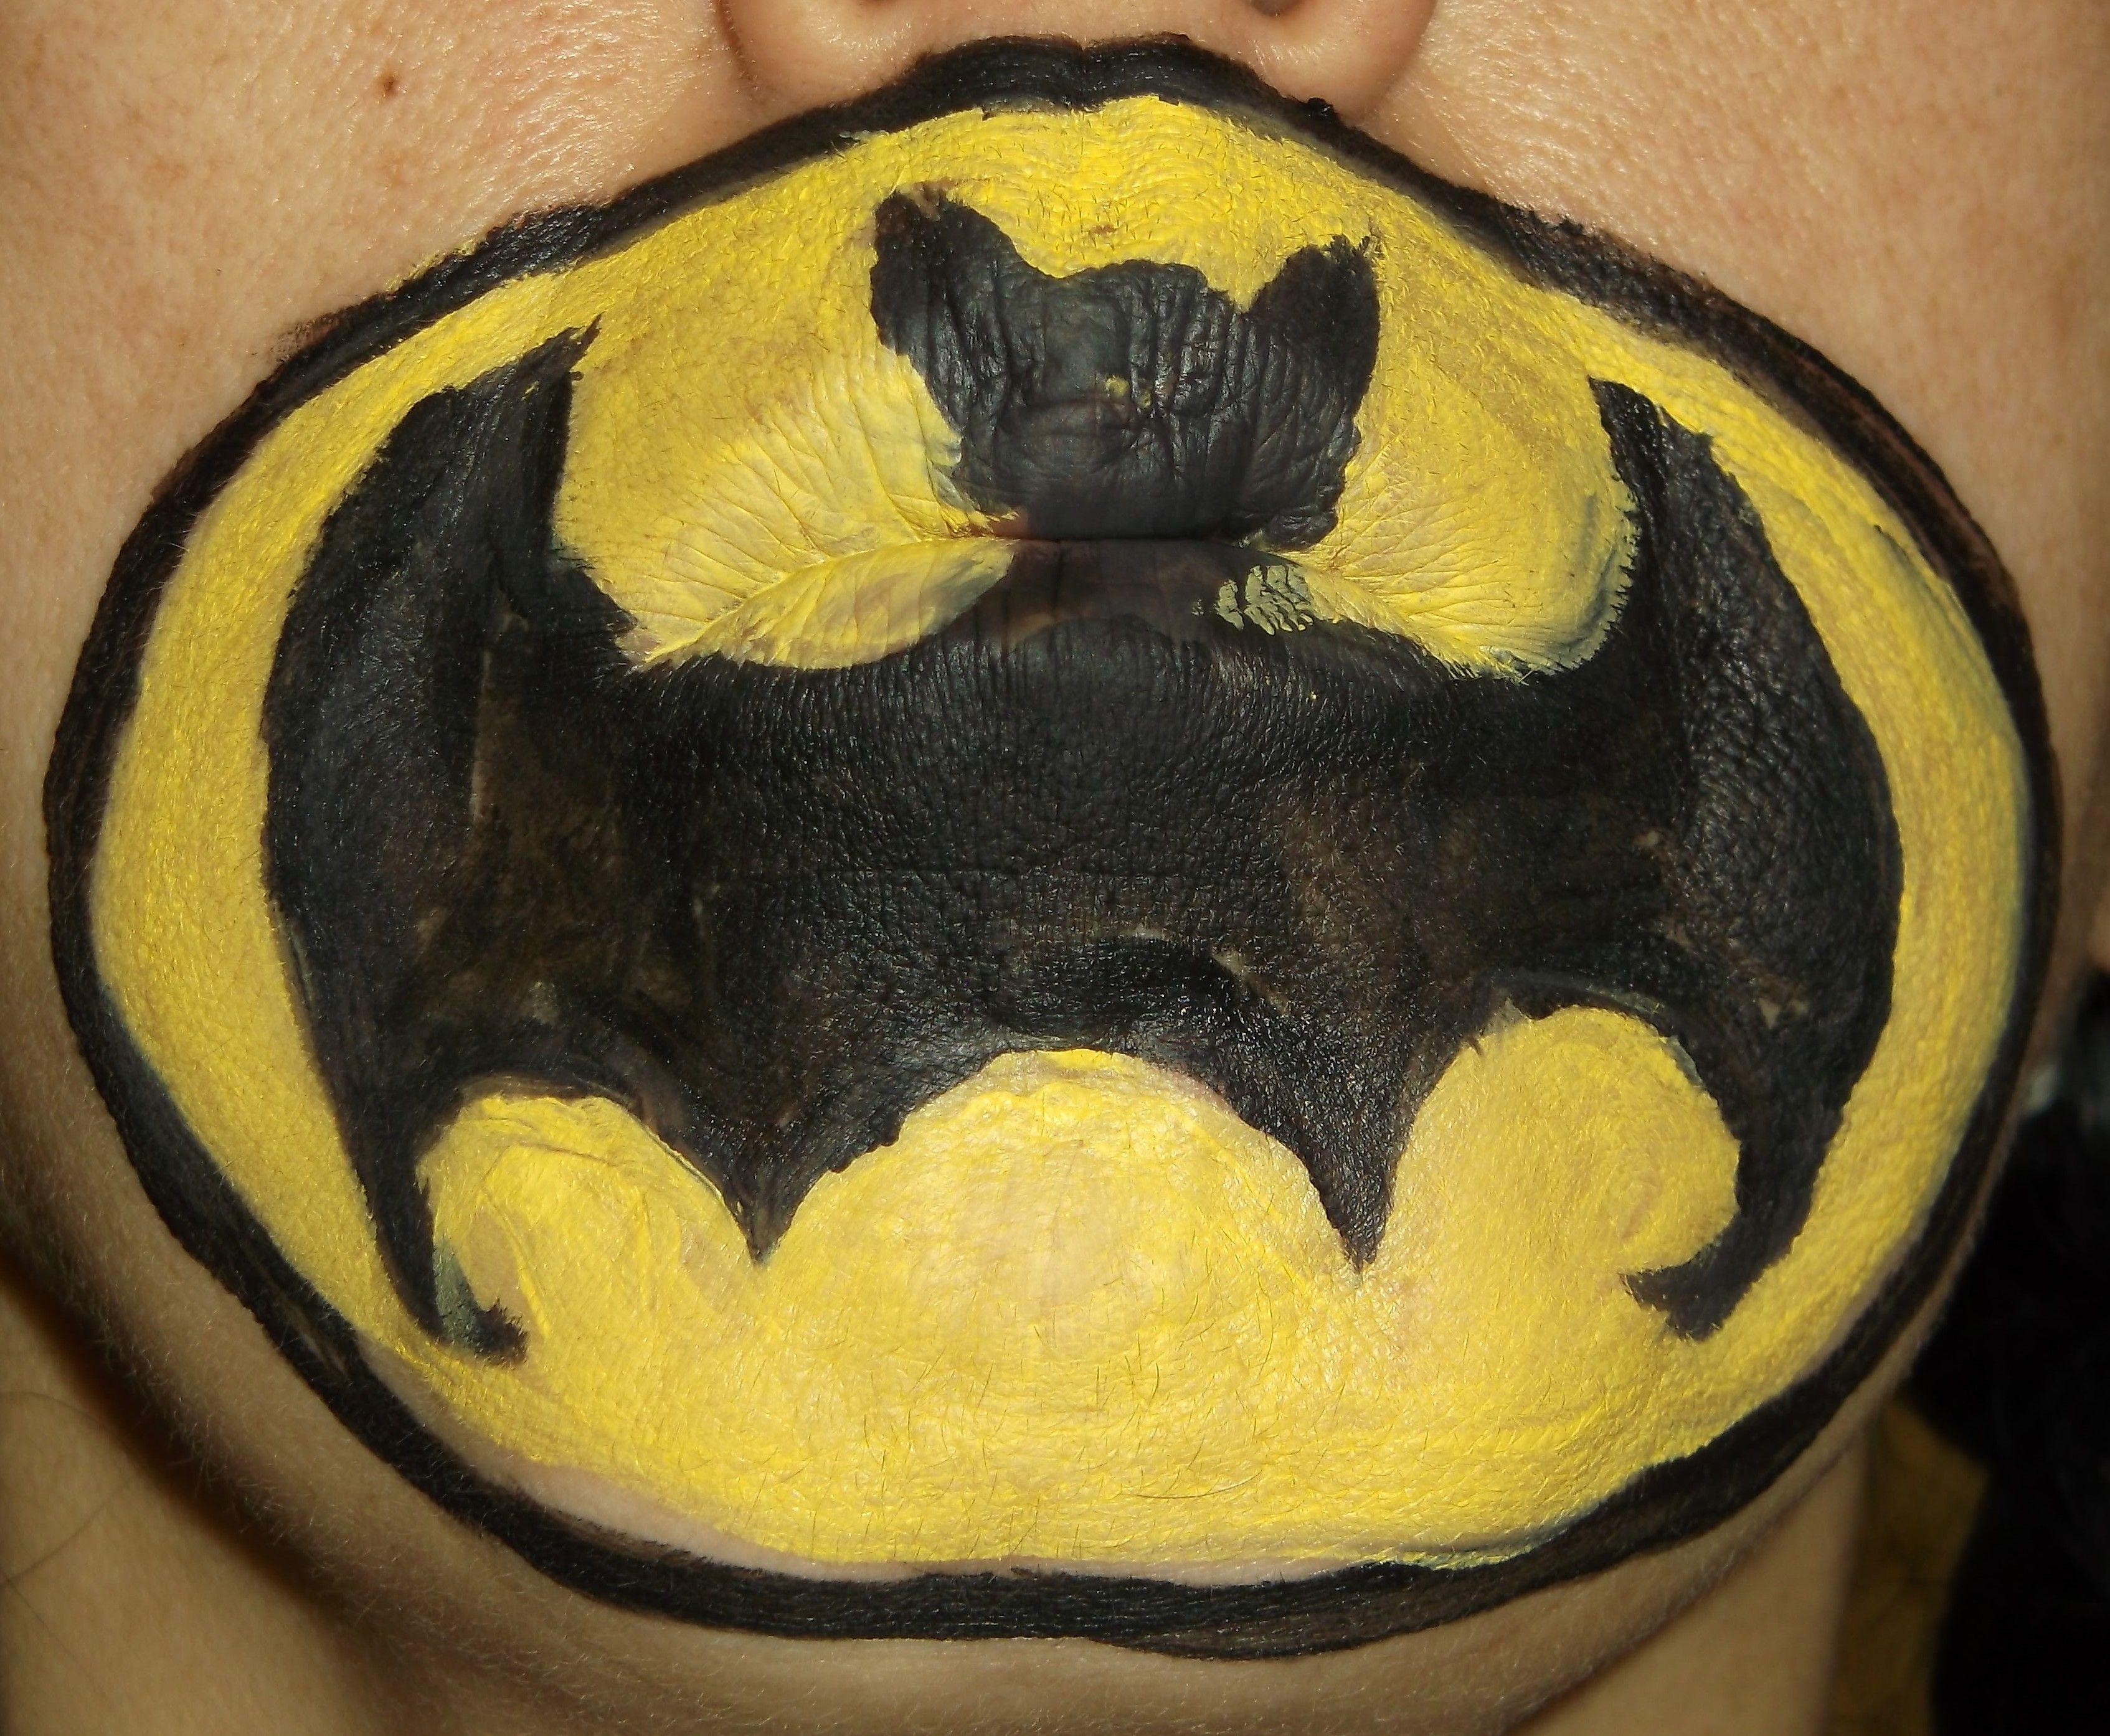 Batman logo 2012 Oct 26